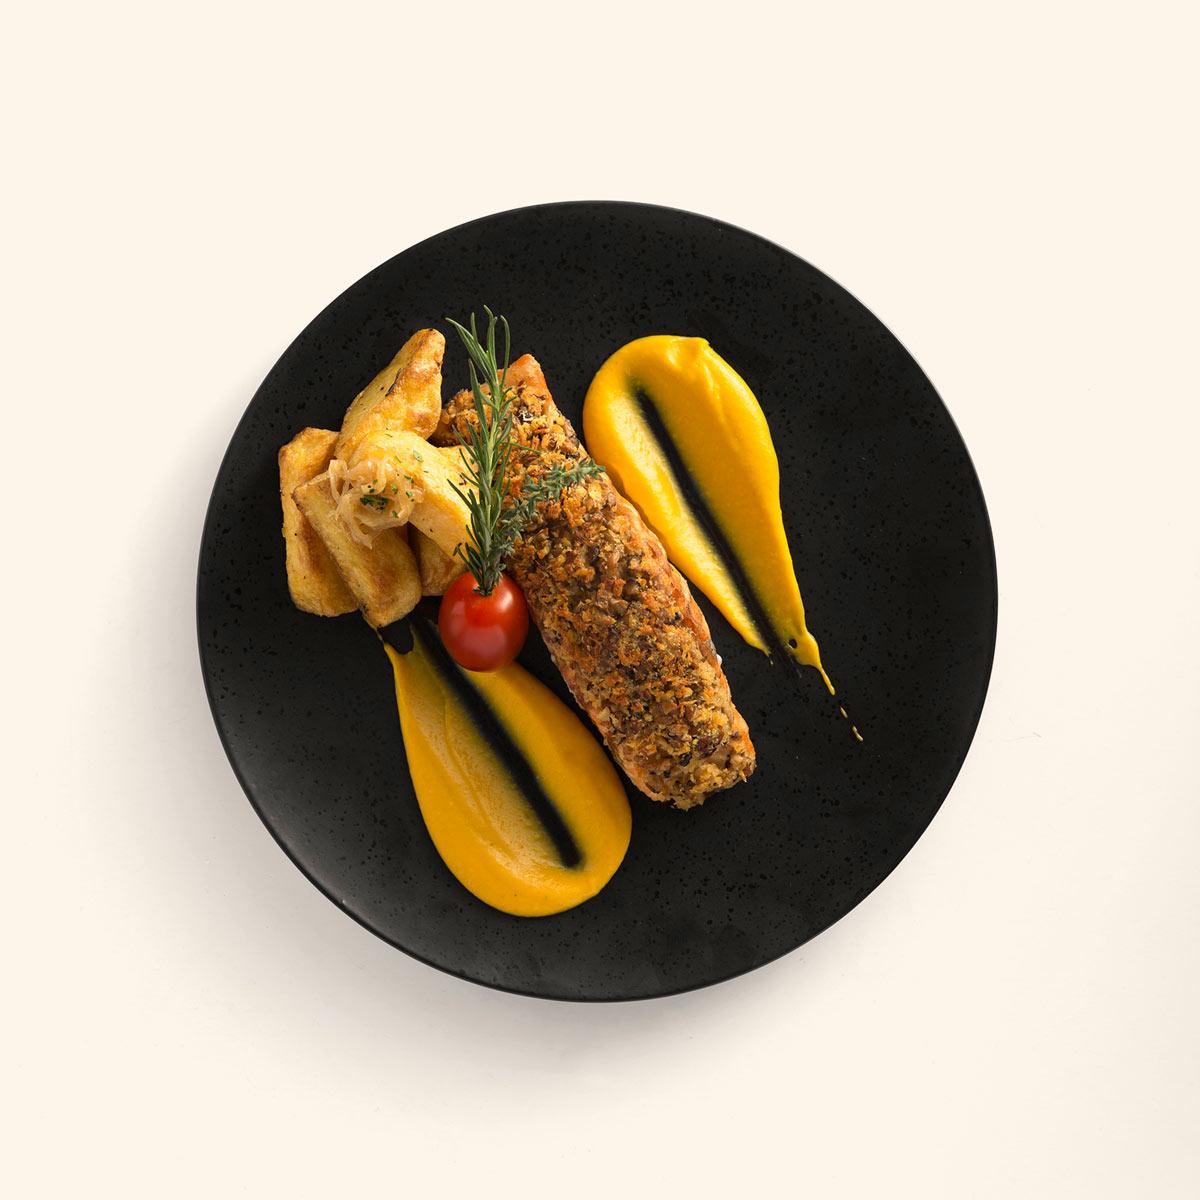 L'Usine - Eatery Crispy salmon